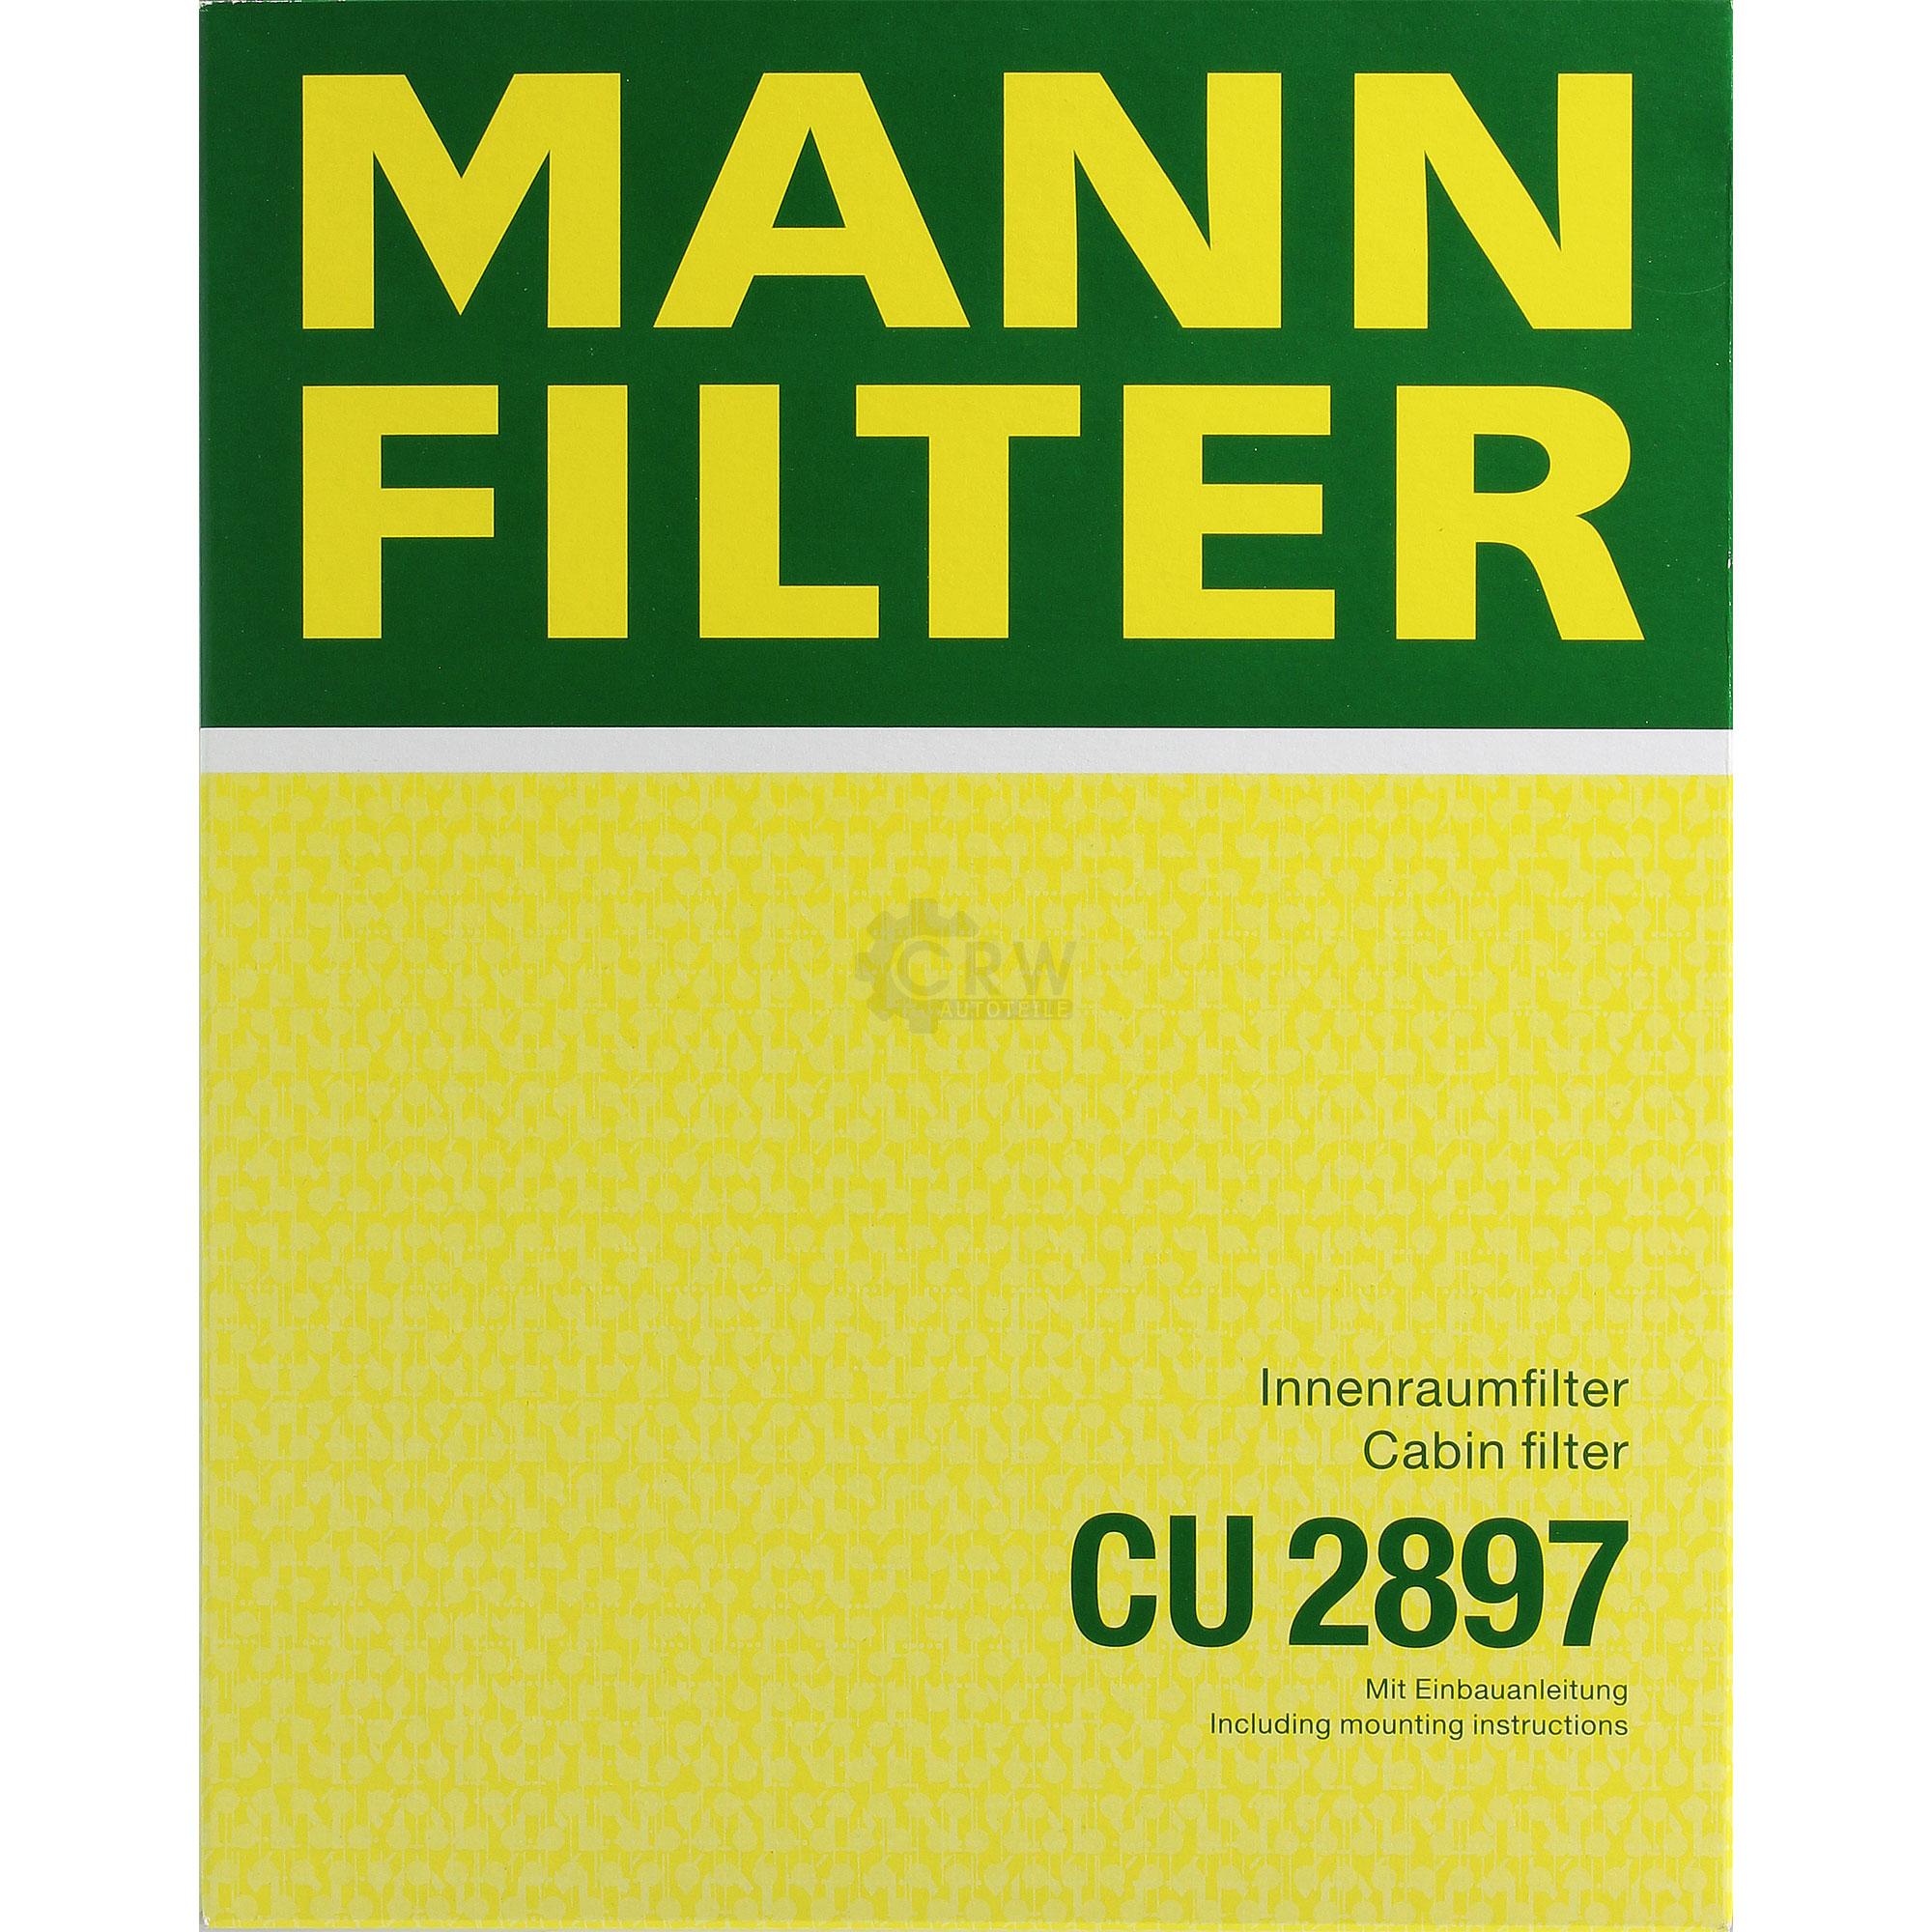 Motor-Ol-6L-MANNOL-Classic-10W-40-MANN-FILTER-Mercedes-Benz-C-Klasse-W202 Indexbild 9